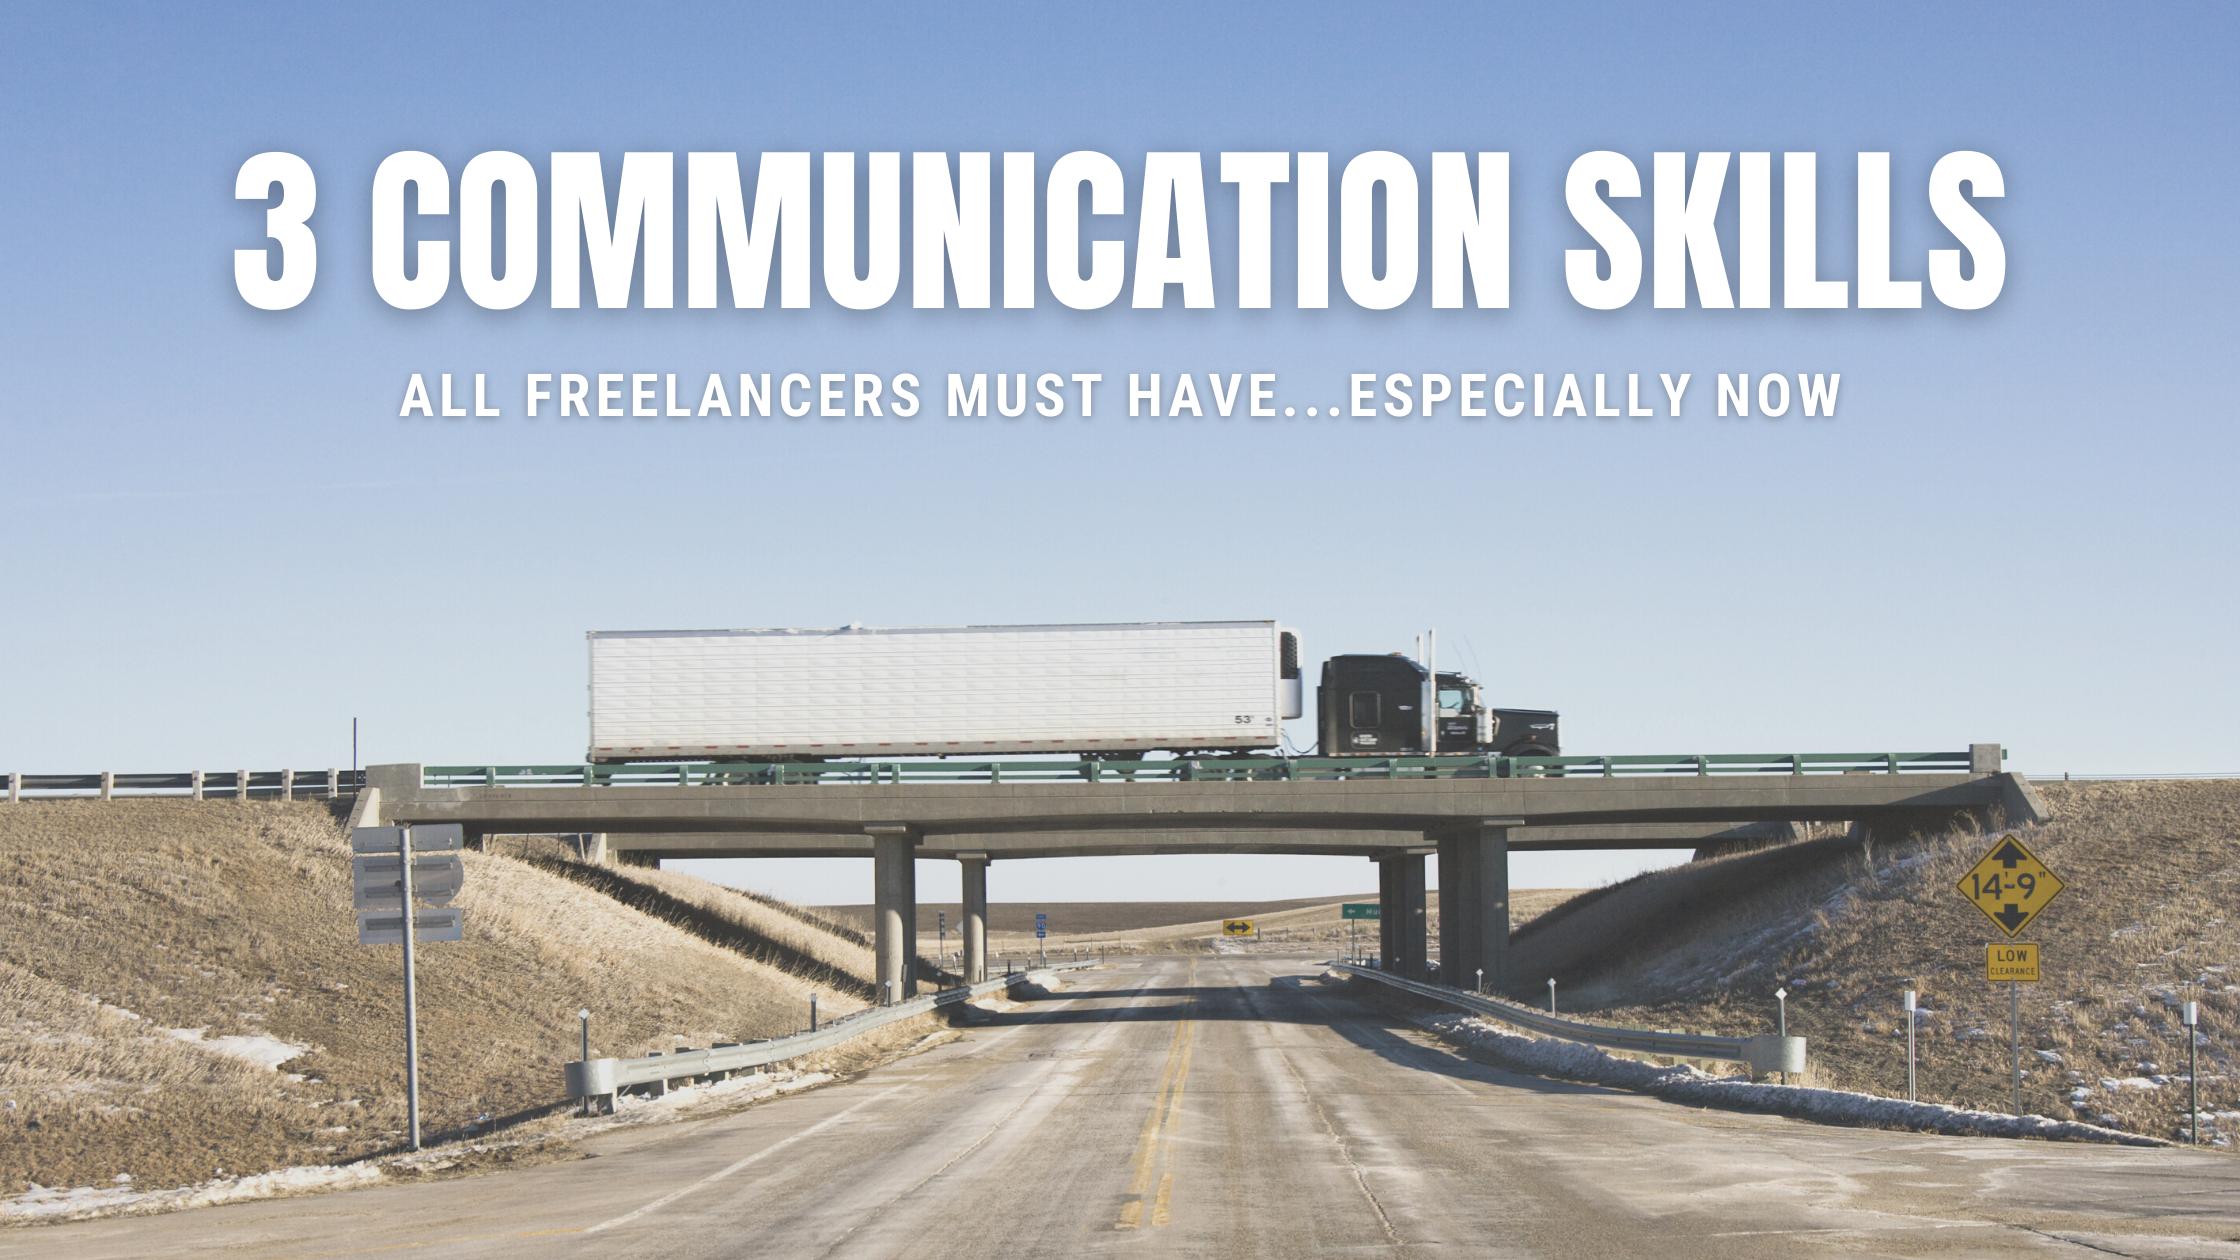 3 Communication Skills All Freelancers Must Have